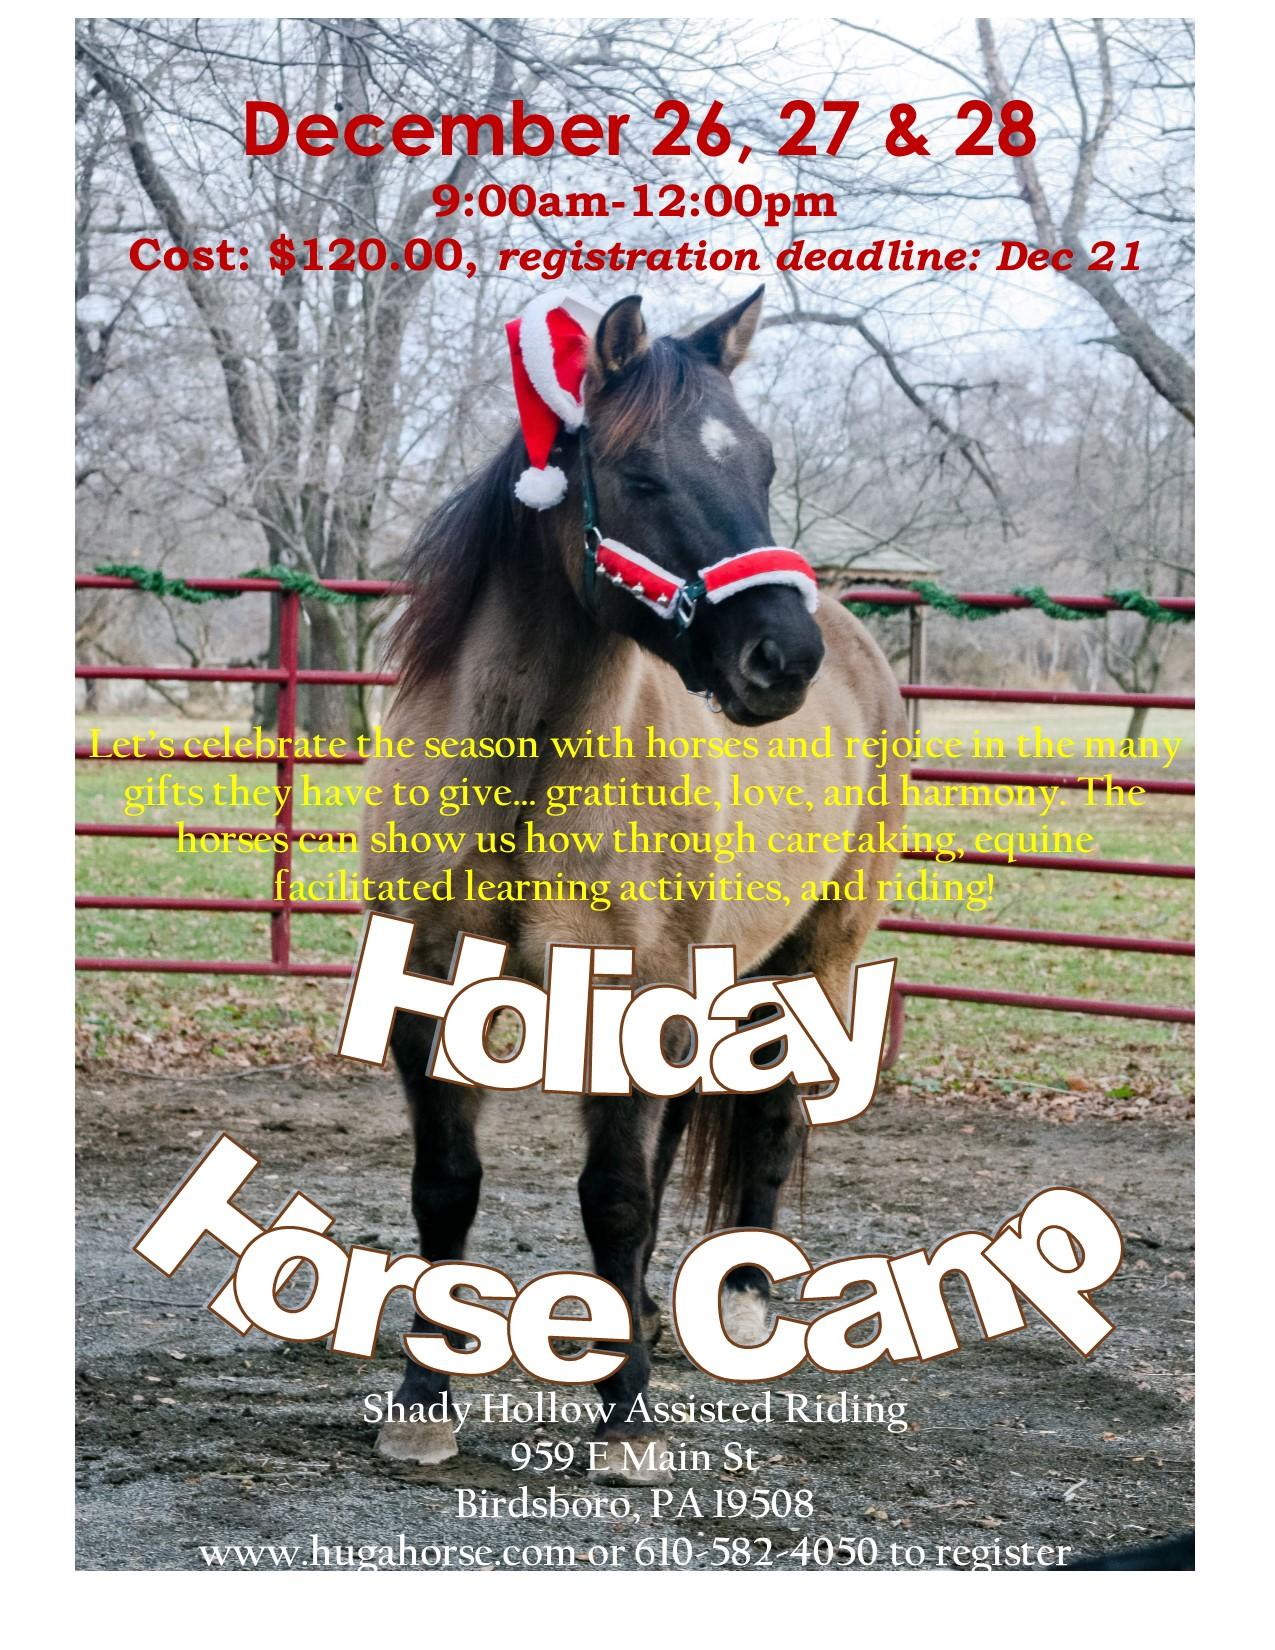 holidayhorsecamp2018.jpg